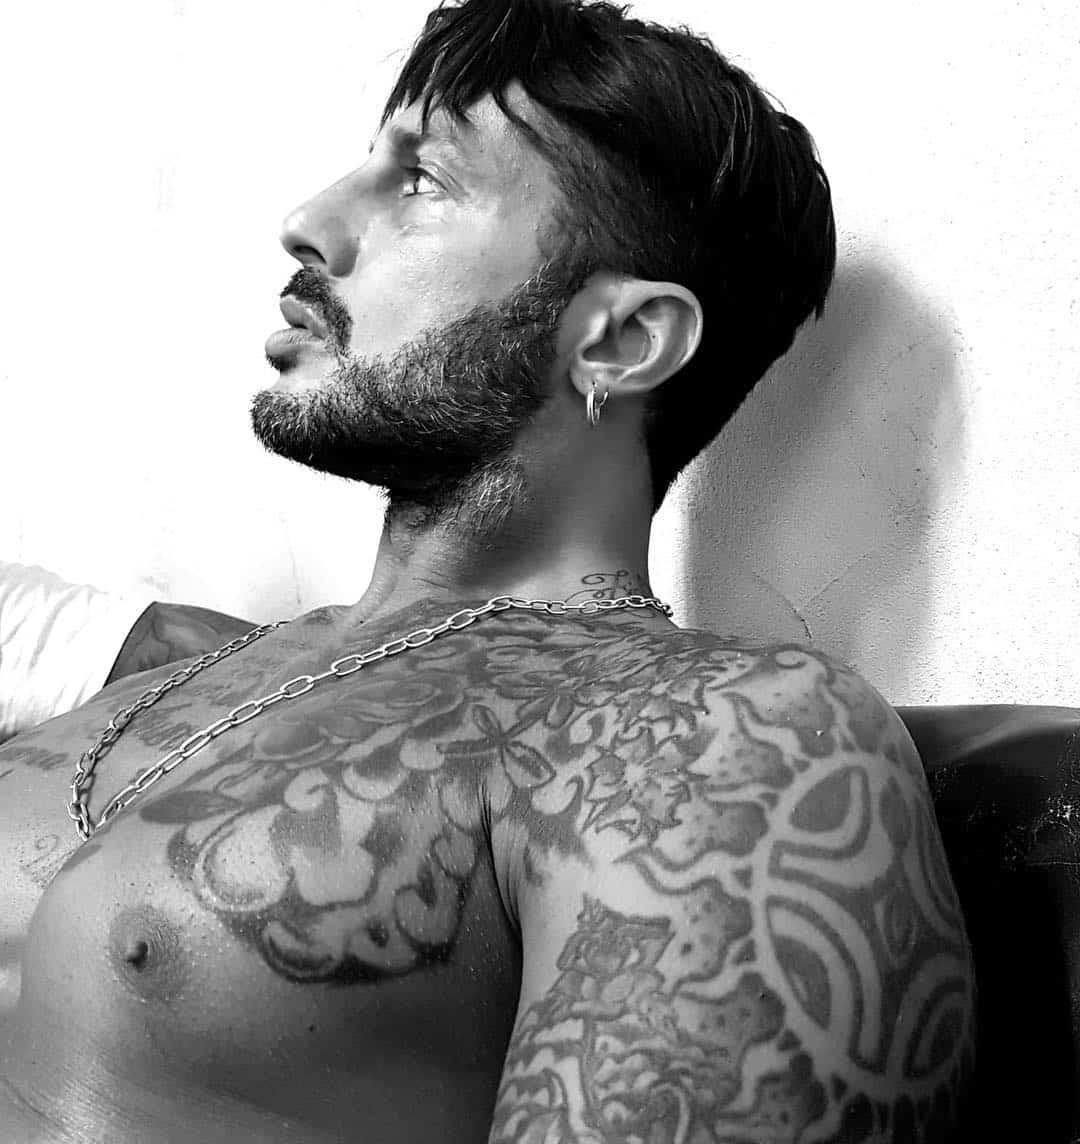 tattoo braccio photocredit @fabriziocoronareal